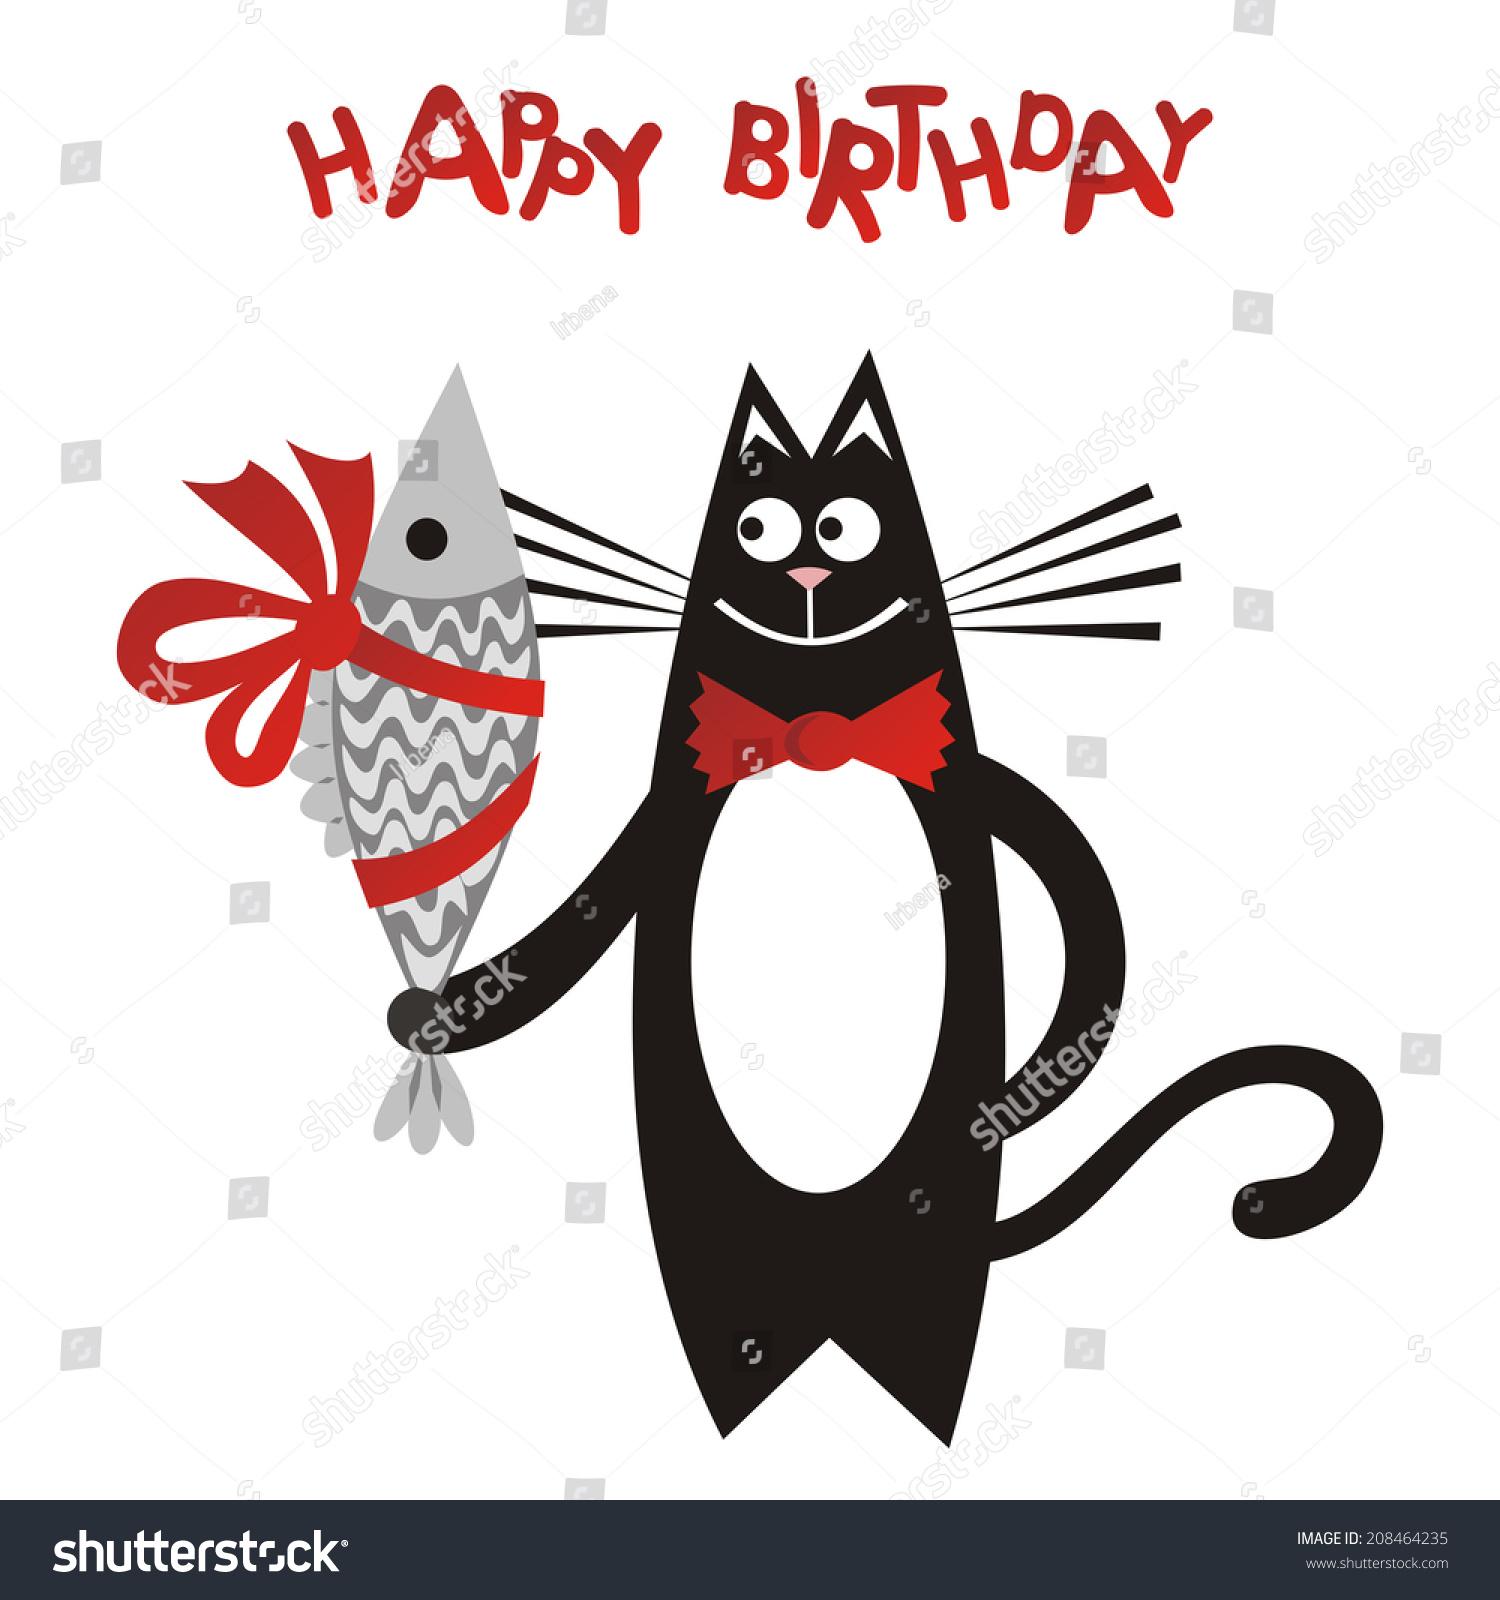 Happy birthday greeting card cat fish stock photo photo vector happy birthday greeting card cat with fish vector illustration bookmarktalkfo Gallery